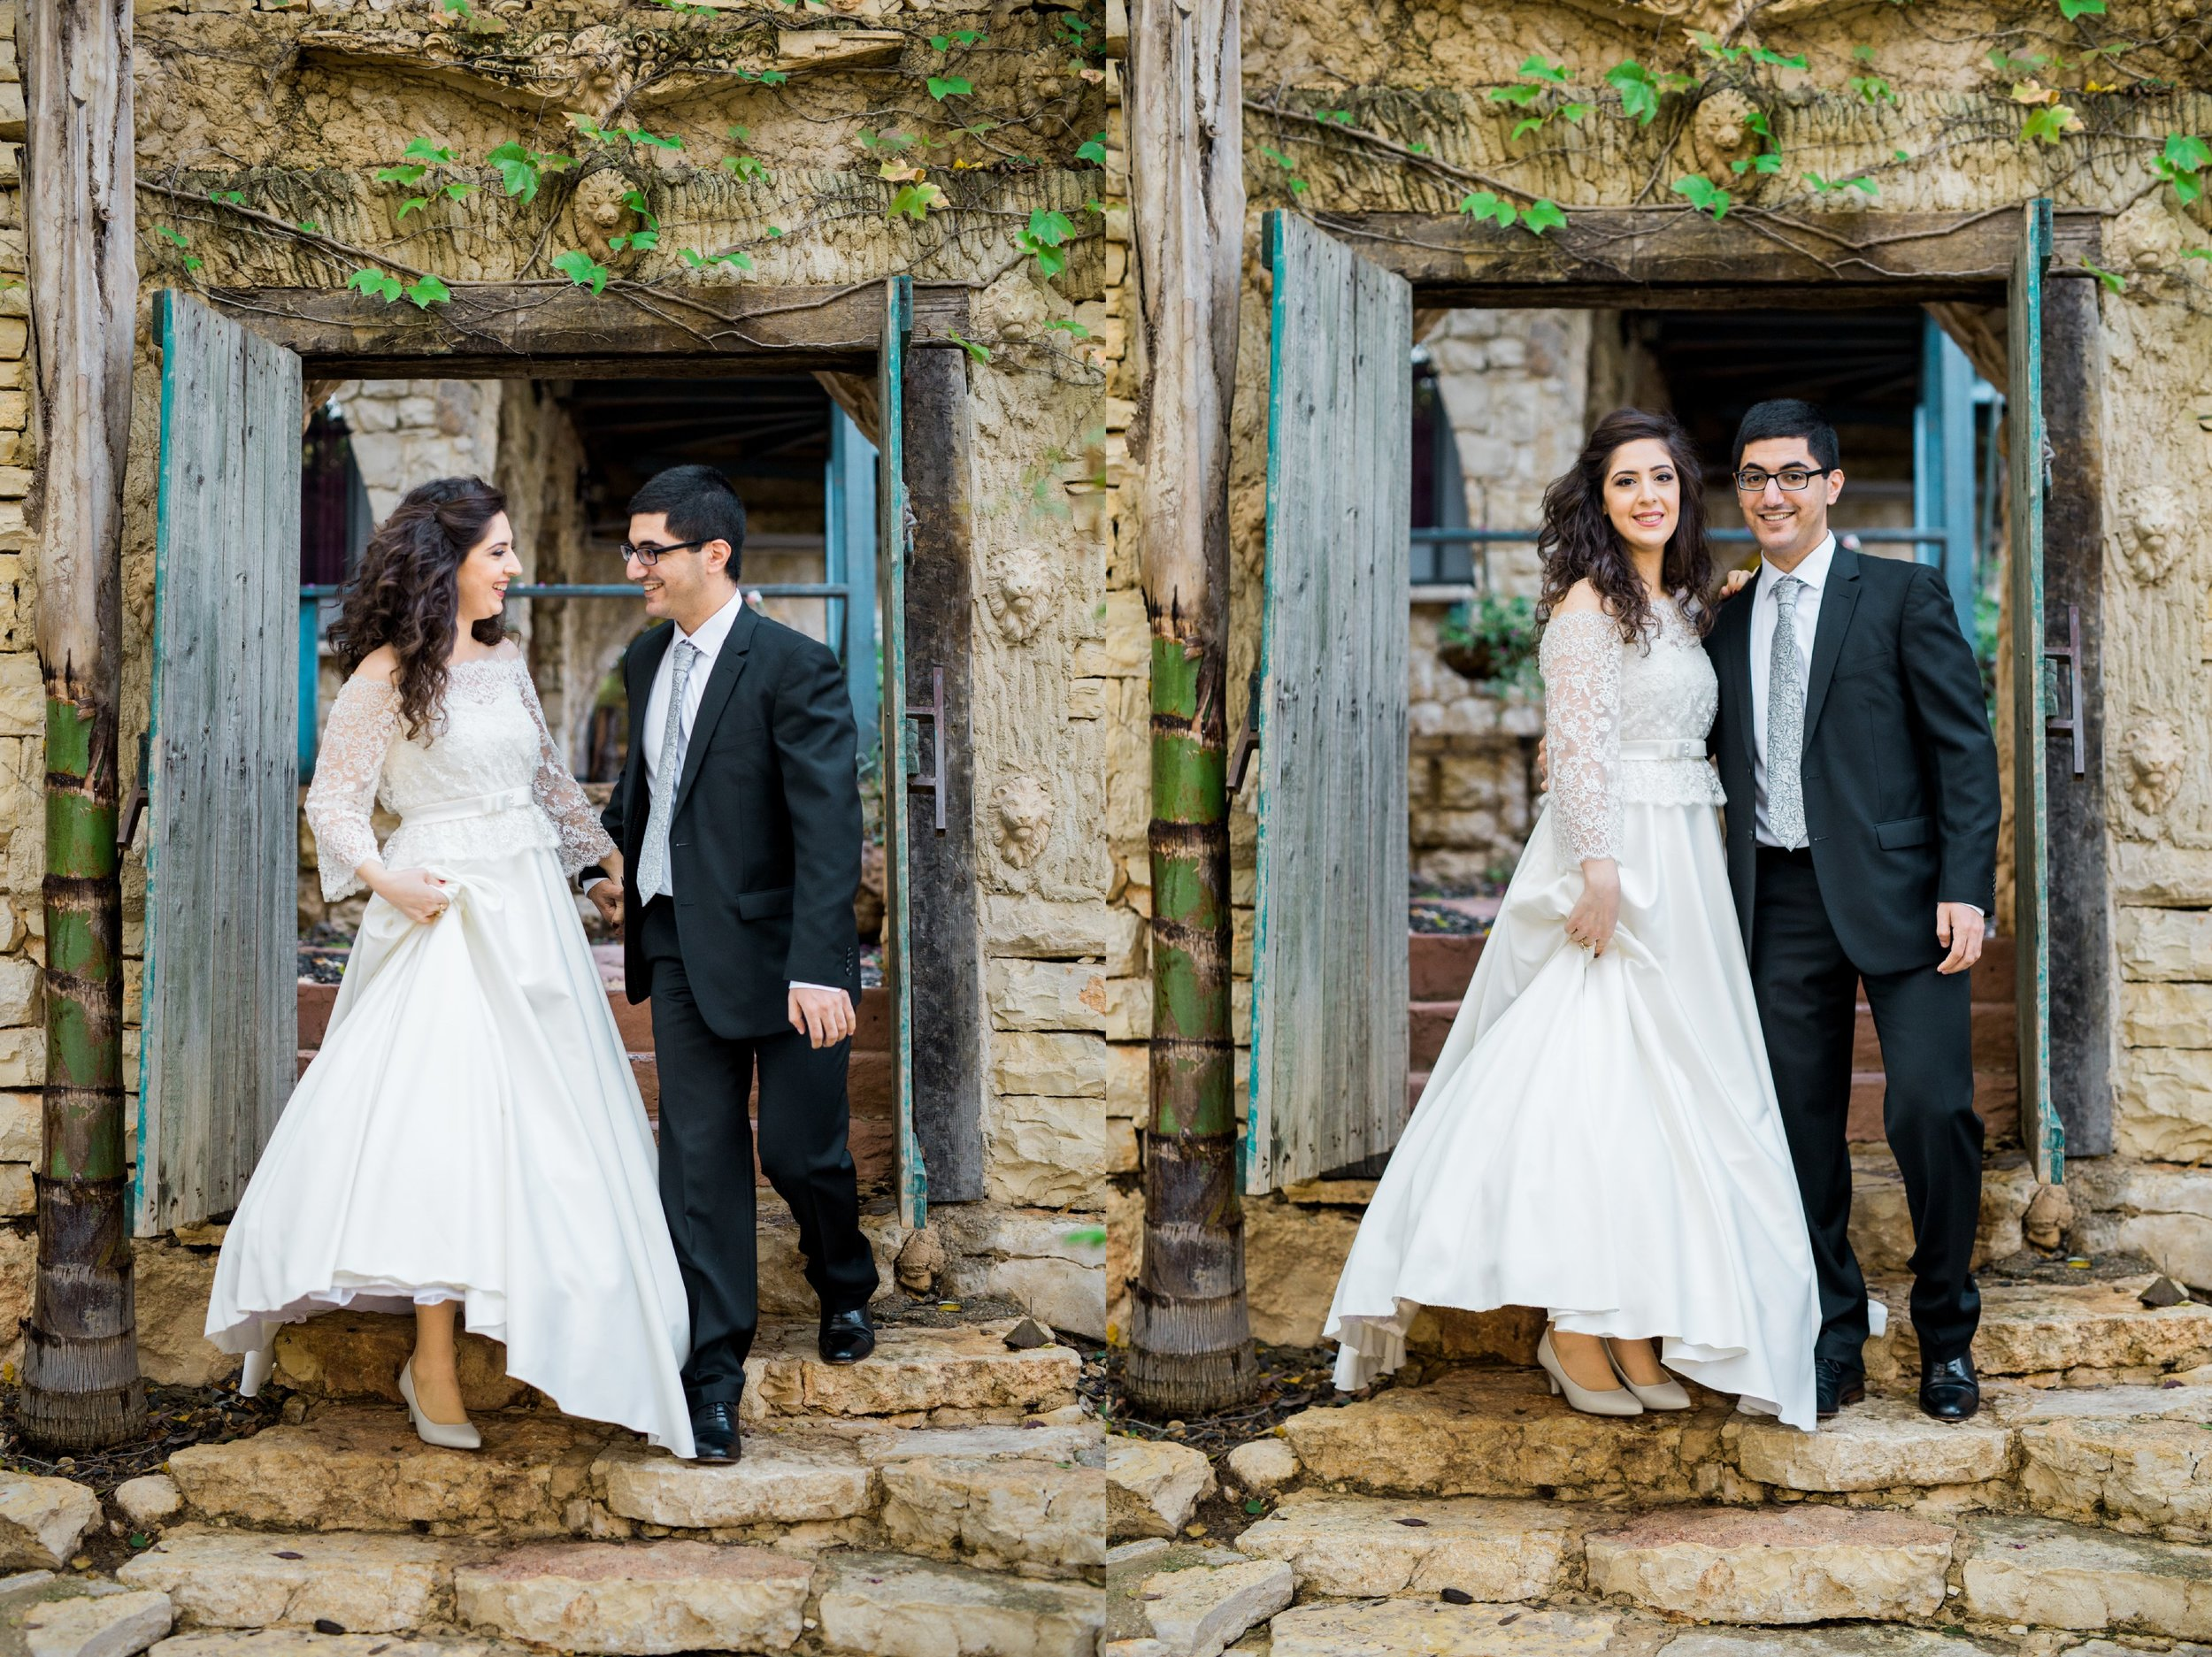 israel-garden-wedding-portraits-session-kate-giryes-photography--10_WEB.jpg